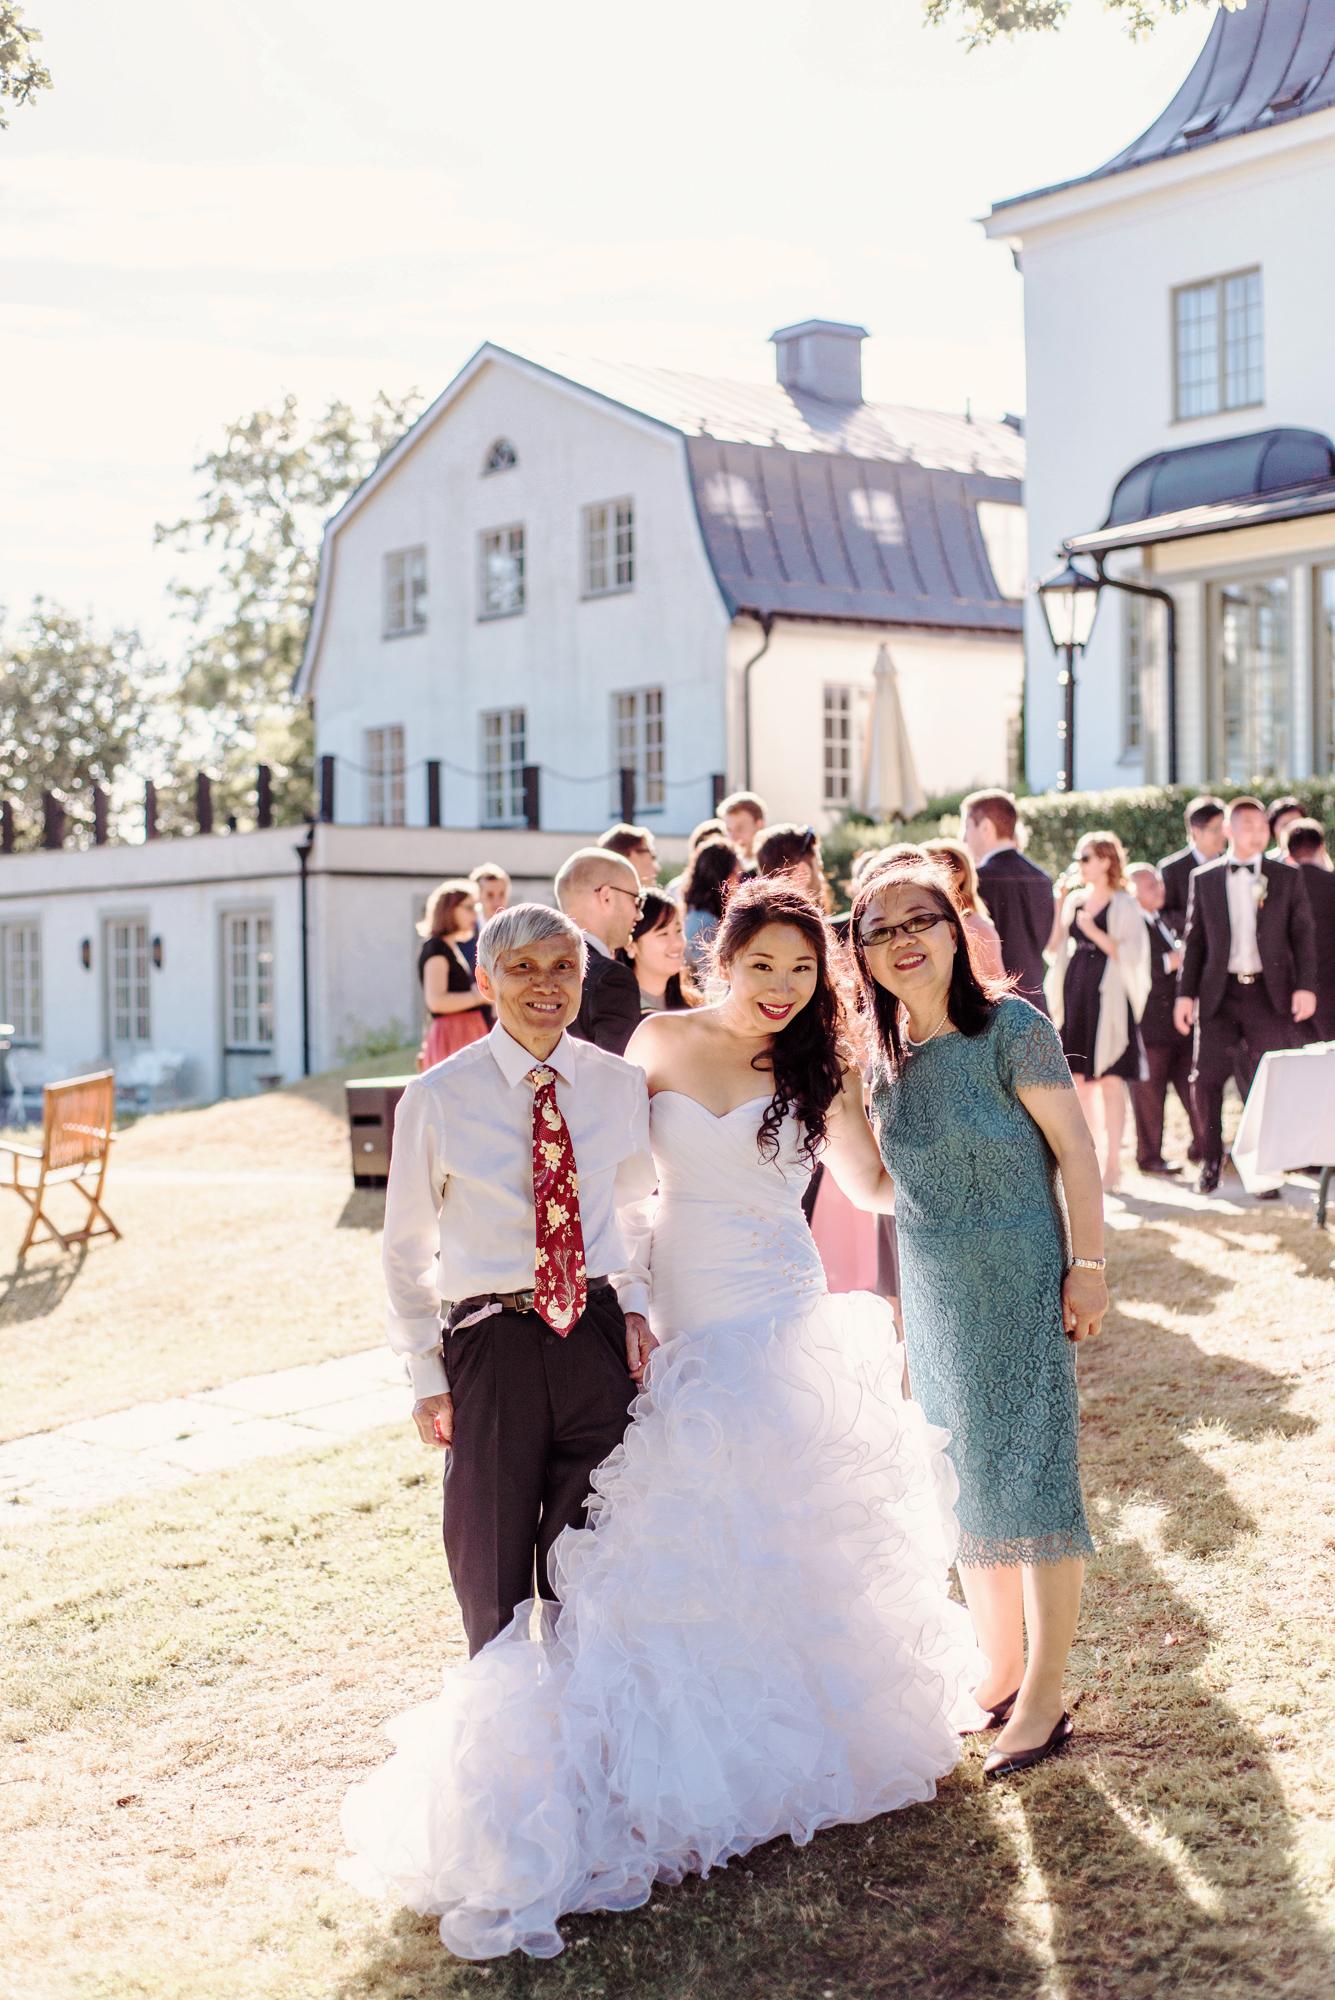 Romantic Outdoor Ceremony Wedding Photographer, Bröllopsfotograf Stockholm